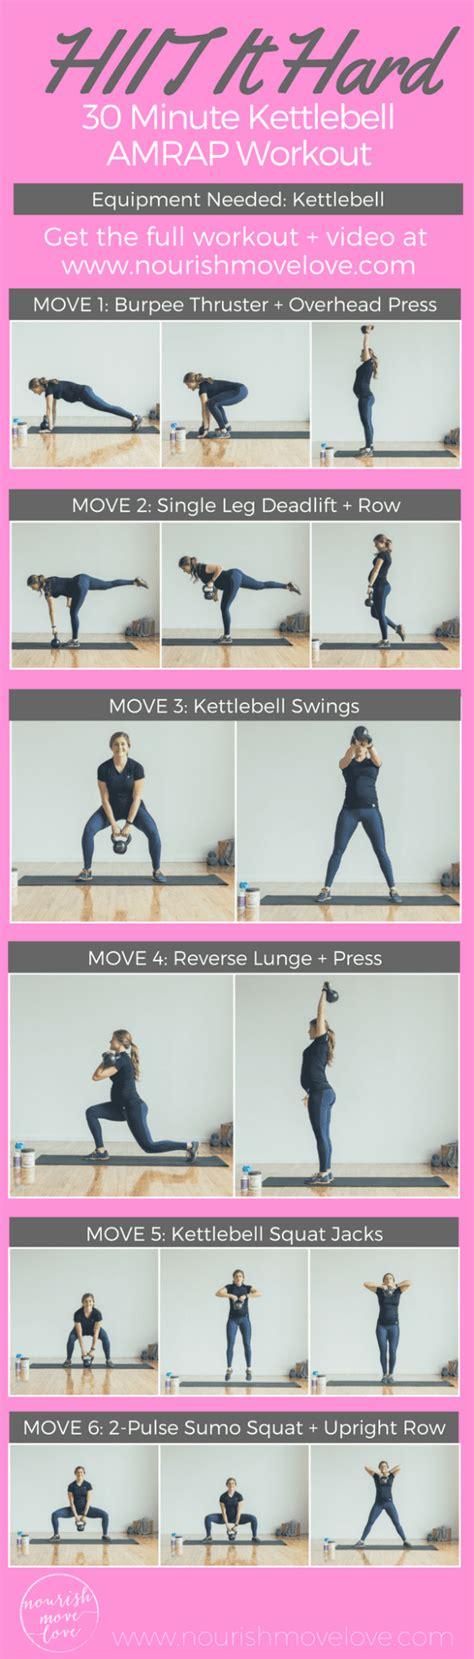 kettlebell workout hiit minute amrap hard workouts body kettle bell abs nourishmovelove killer exercises min fitness lower dumbbell arms burn